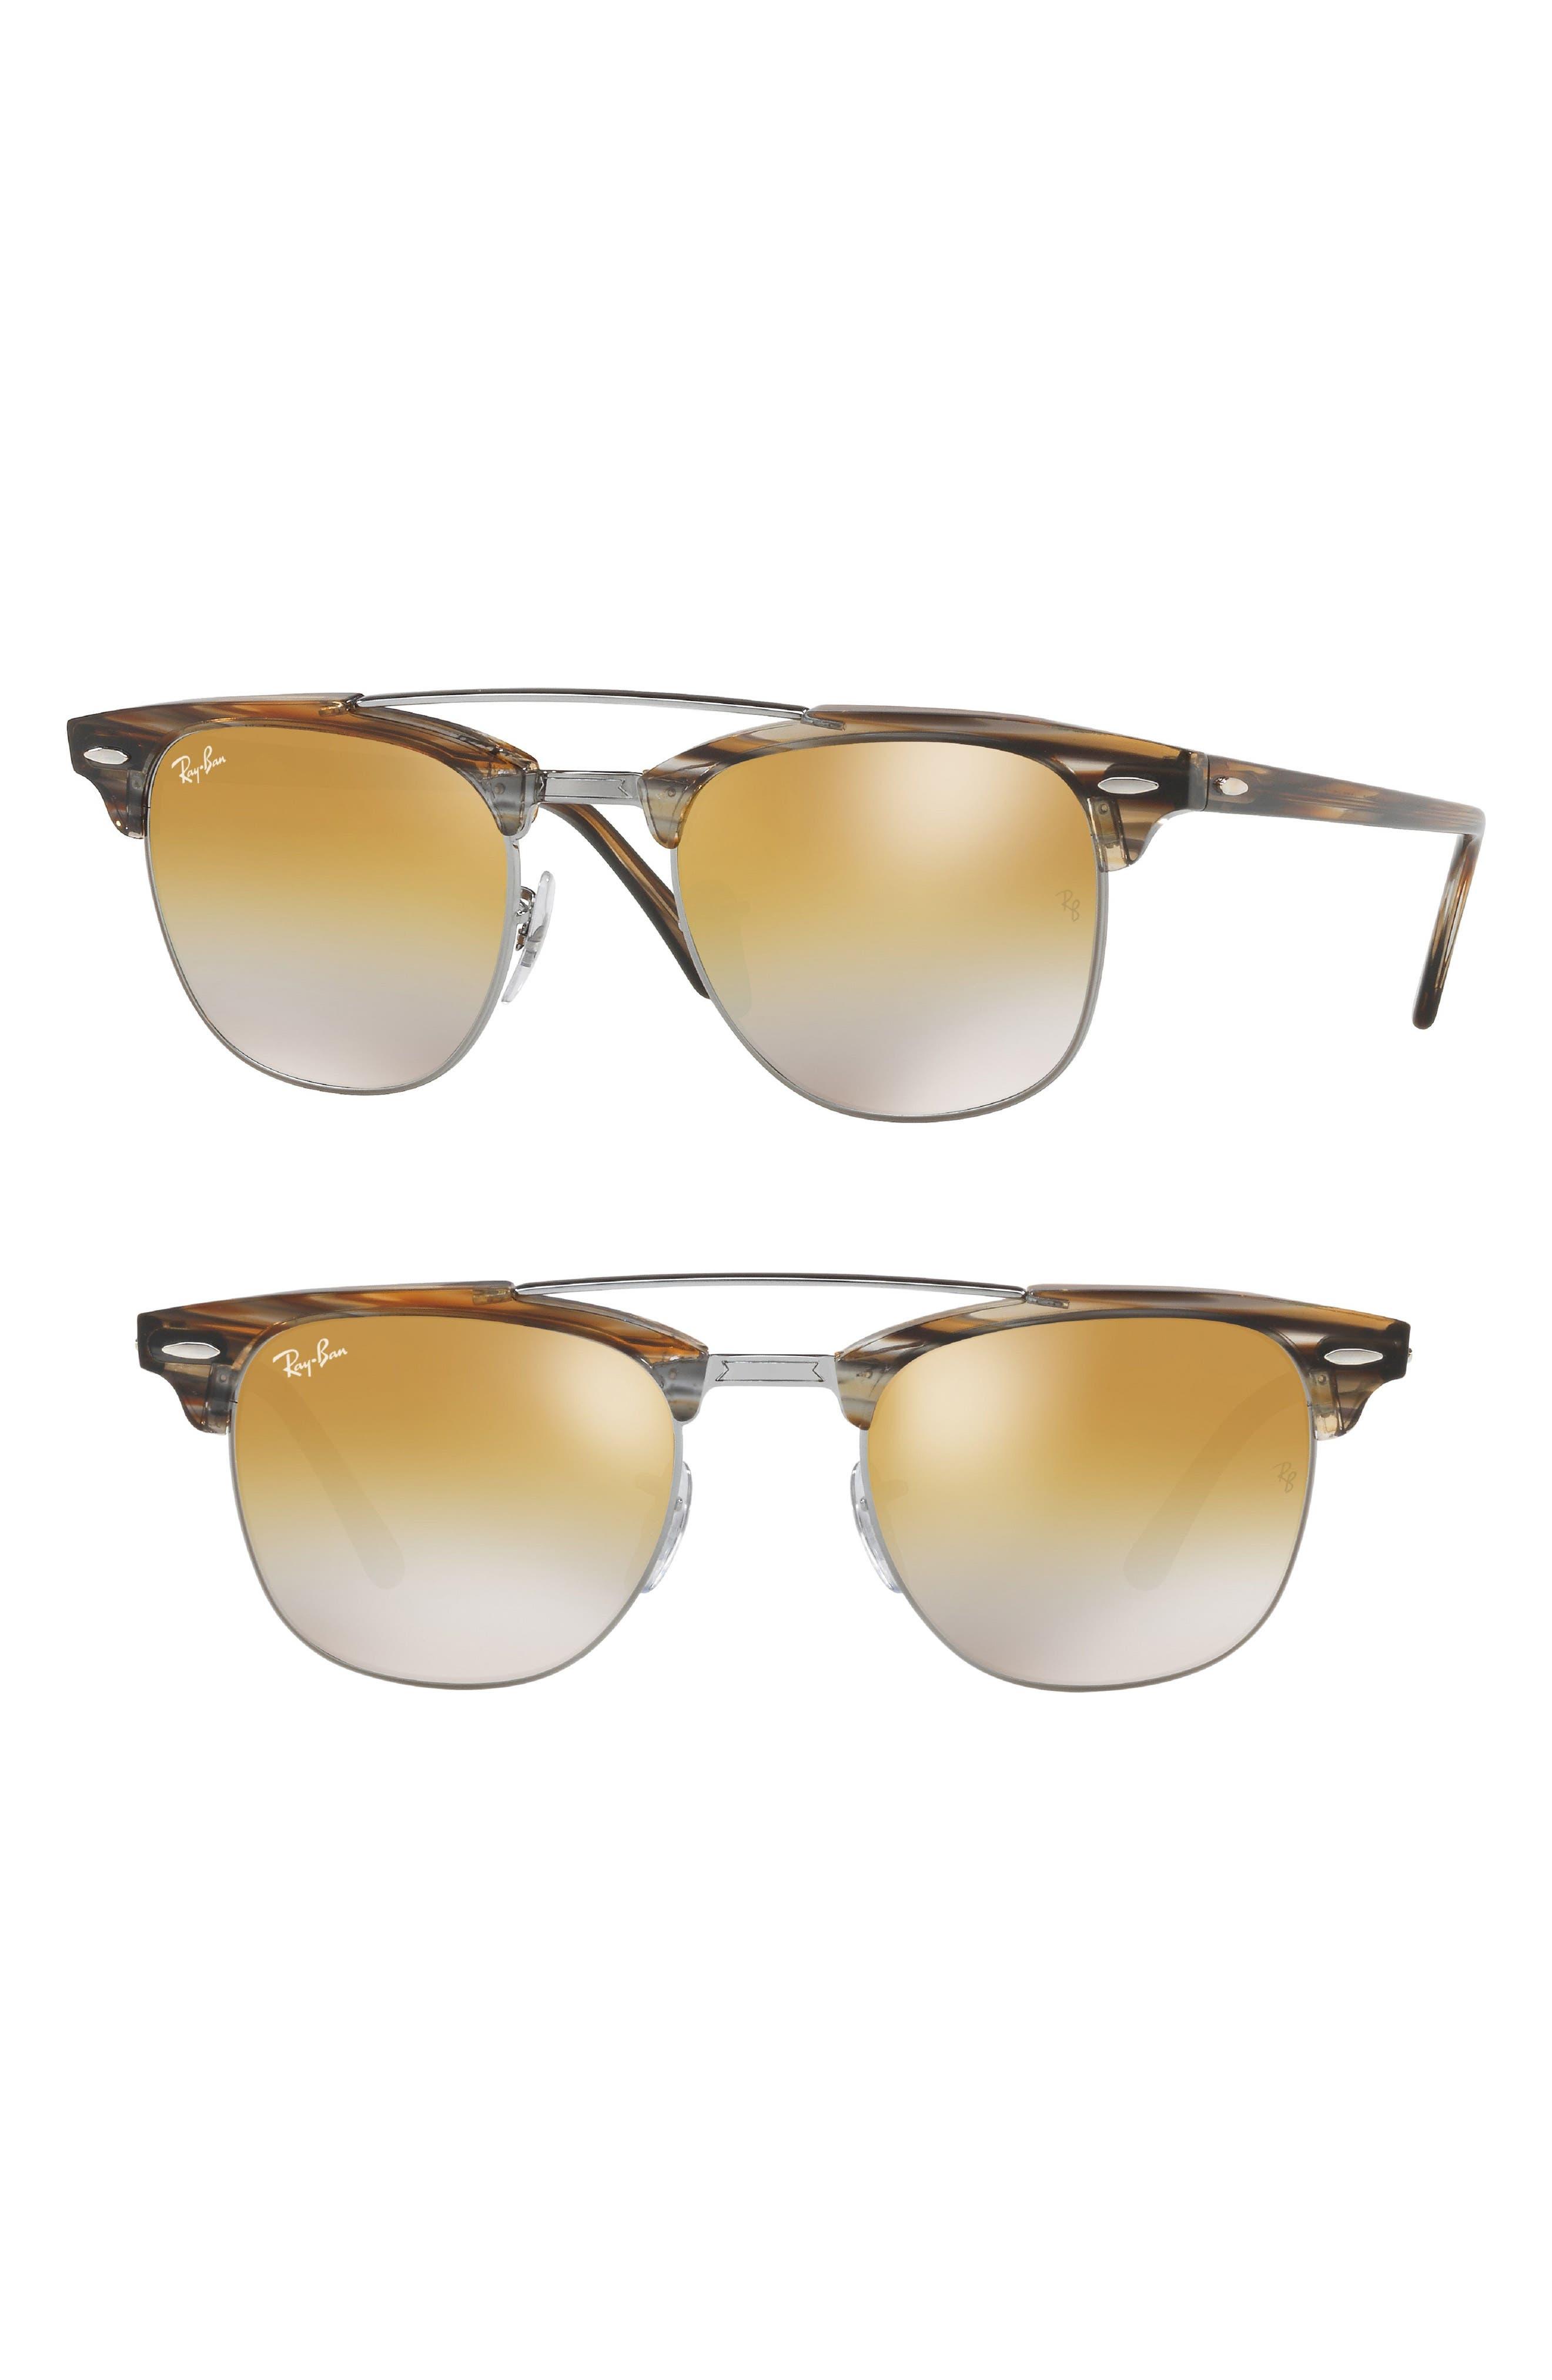 51mm Gradient Mirrored Sunglasses,                         Main,                         color, Gunmetal